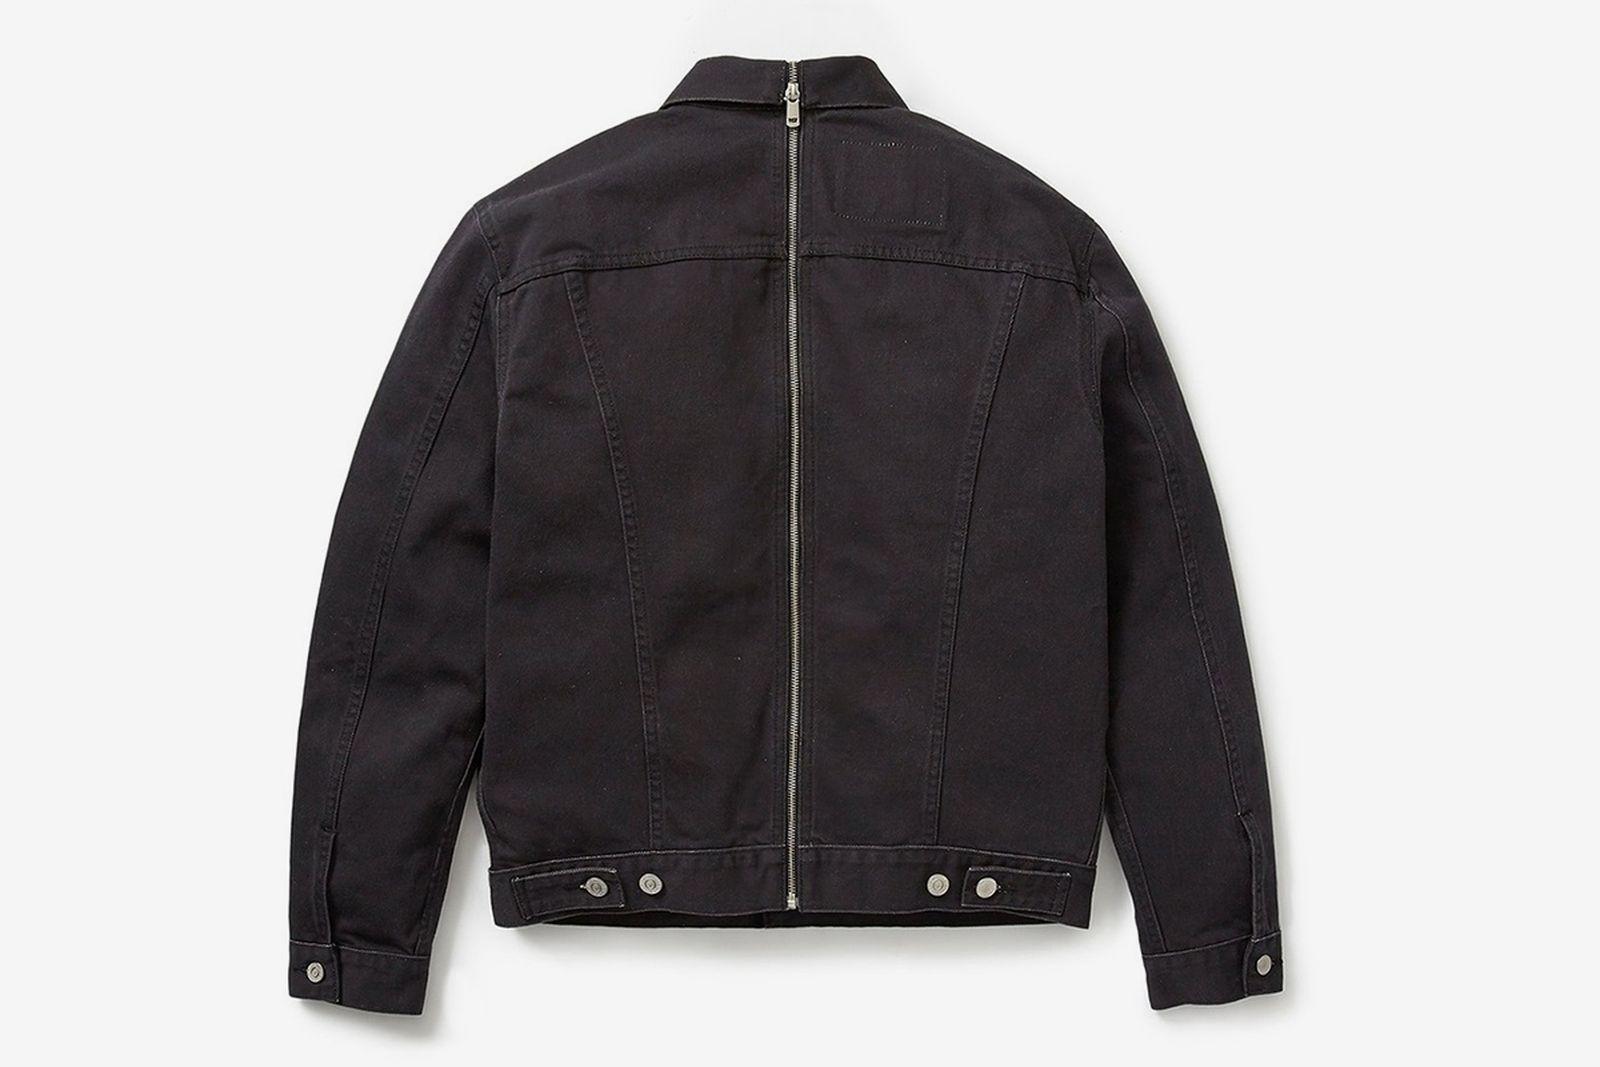 BAPE x Levi's Split Trucker Jackets